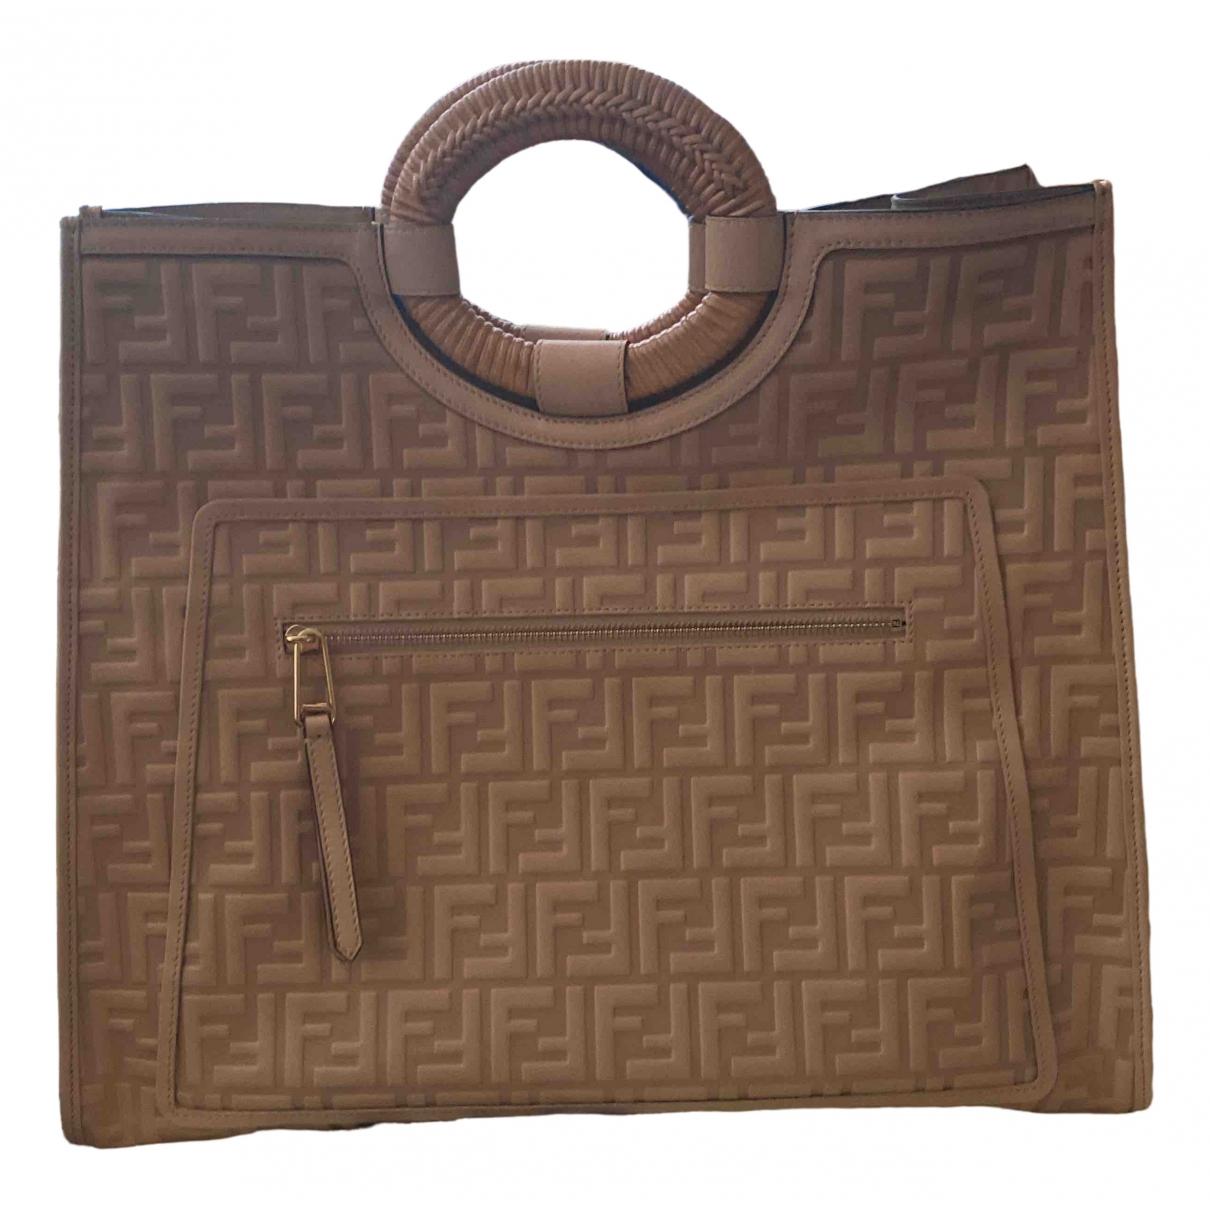 Fendi Runaway Shopping Handtasche in  Beige Leder